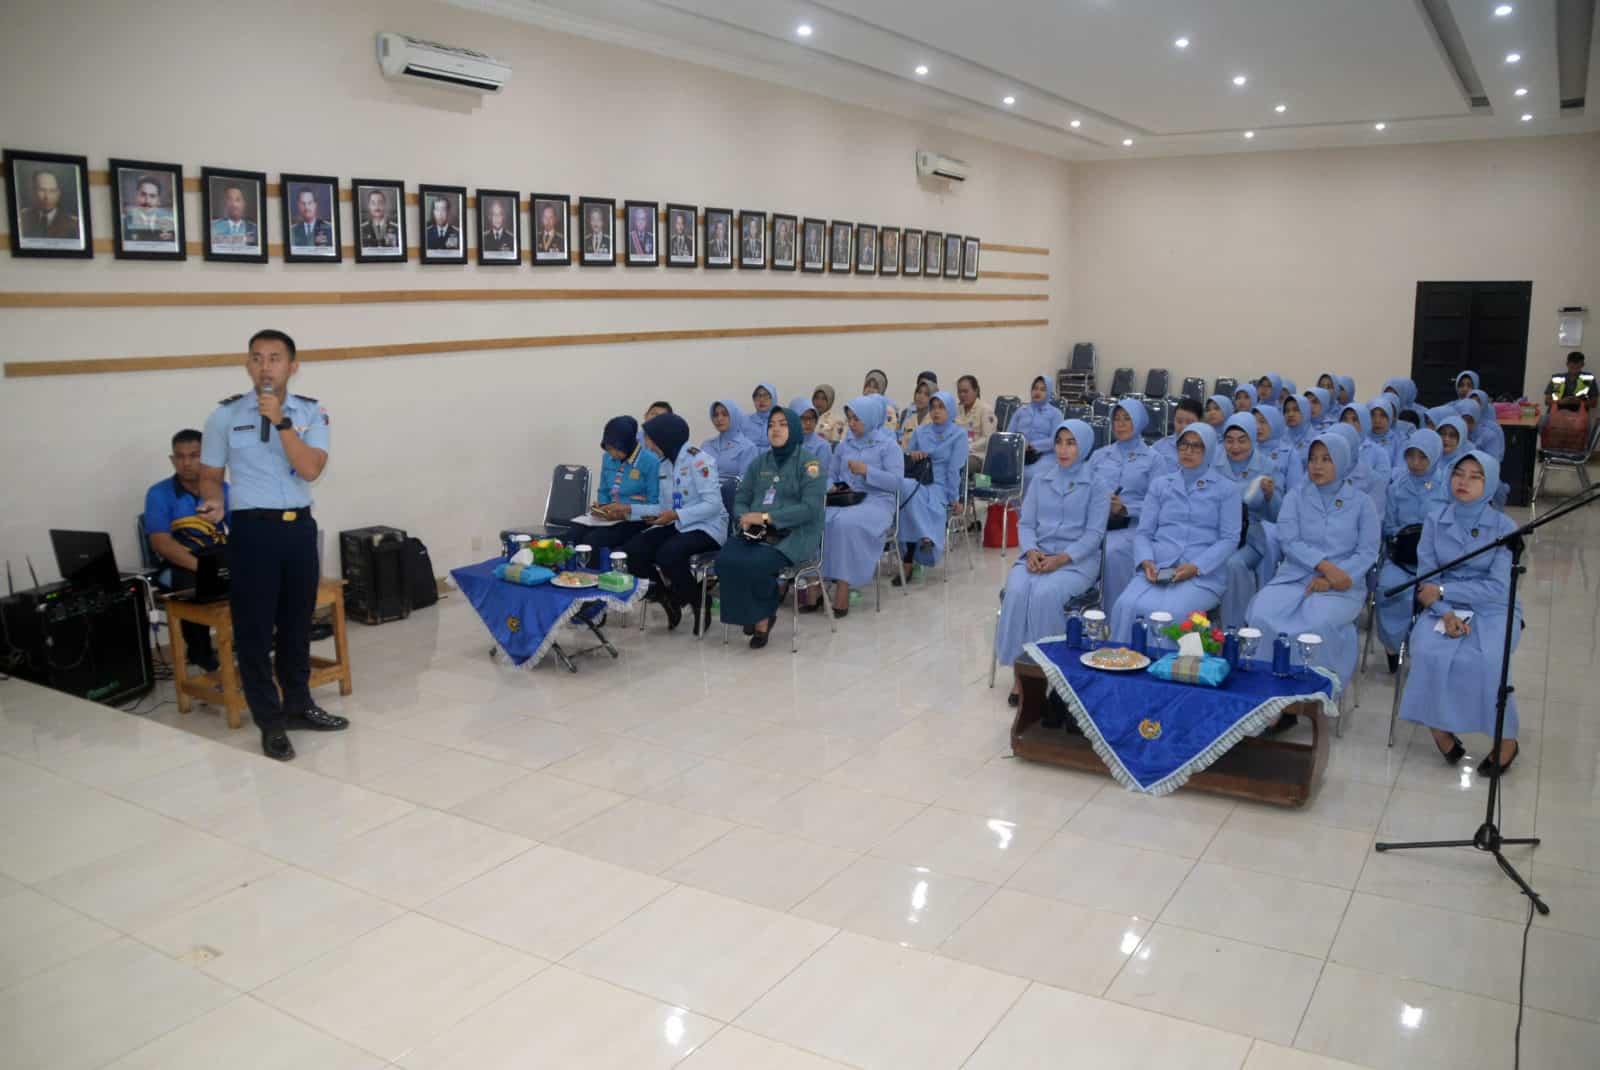 PIA AG Cab.11/D.II Lanud Sjamsudin Noor Gelar Sosialisasi Bahaya Narkoba dan HIV/AIDS Memperingati HUT PIA AG ke-63 Tahun 2019